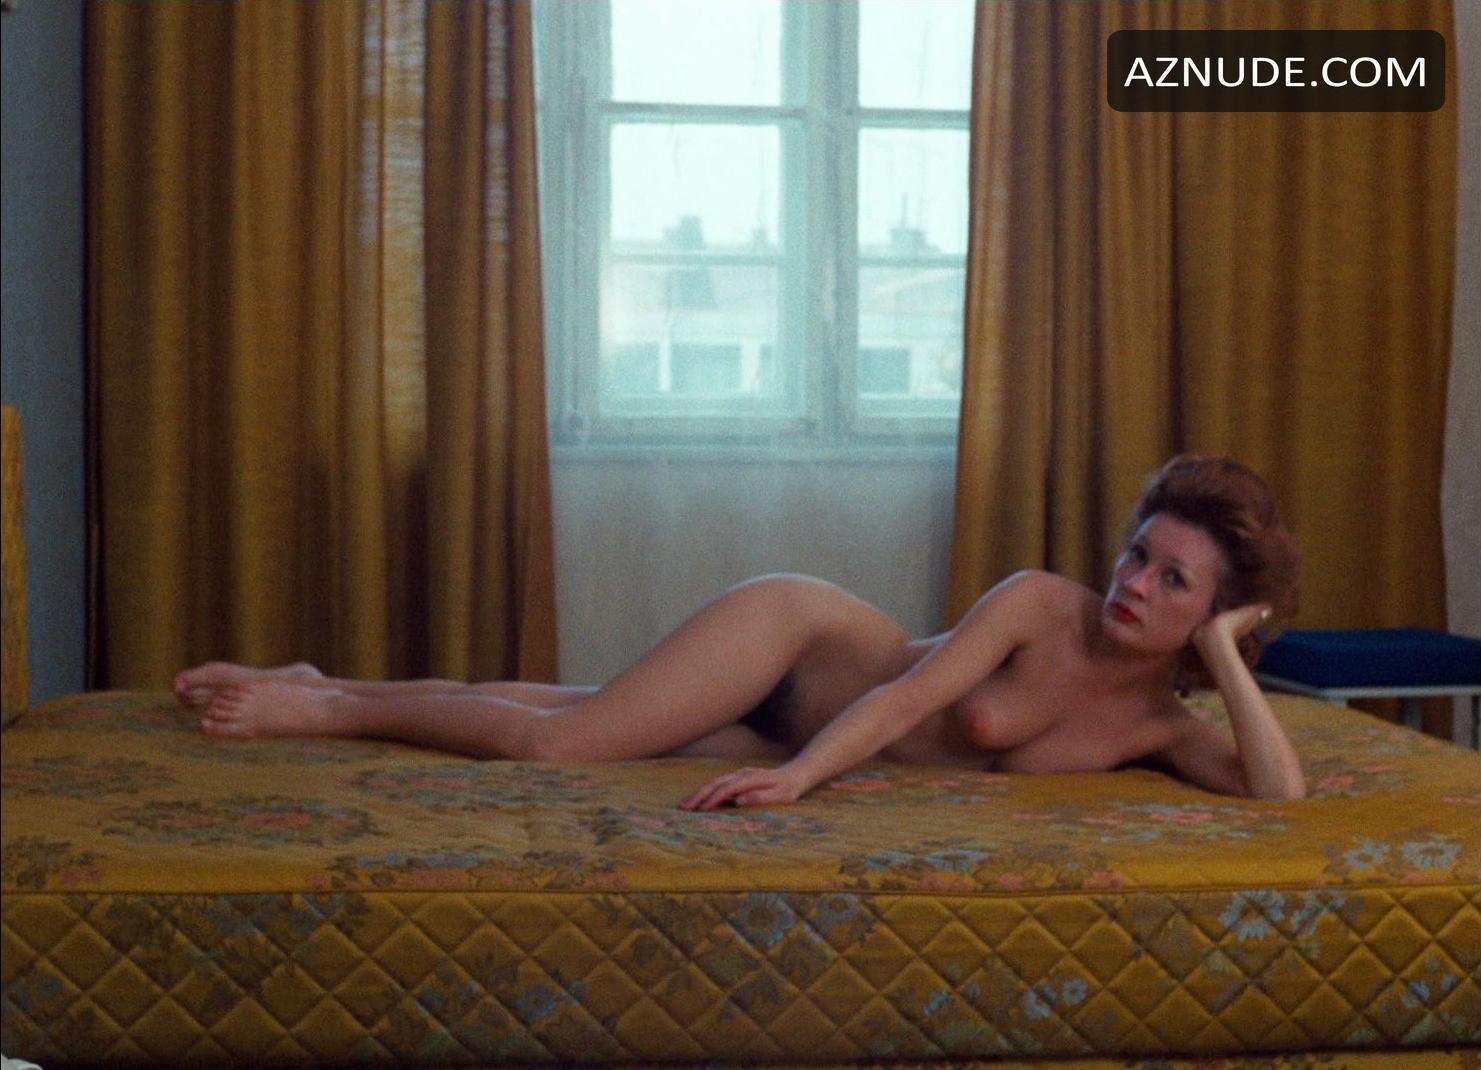 Ingrid Caven Nude - Aznude-5874